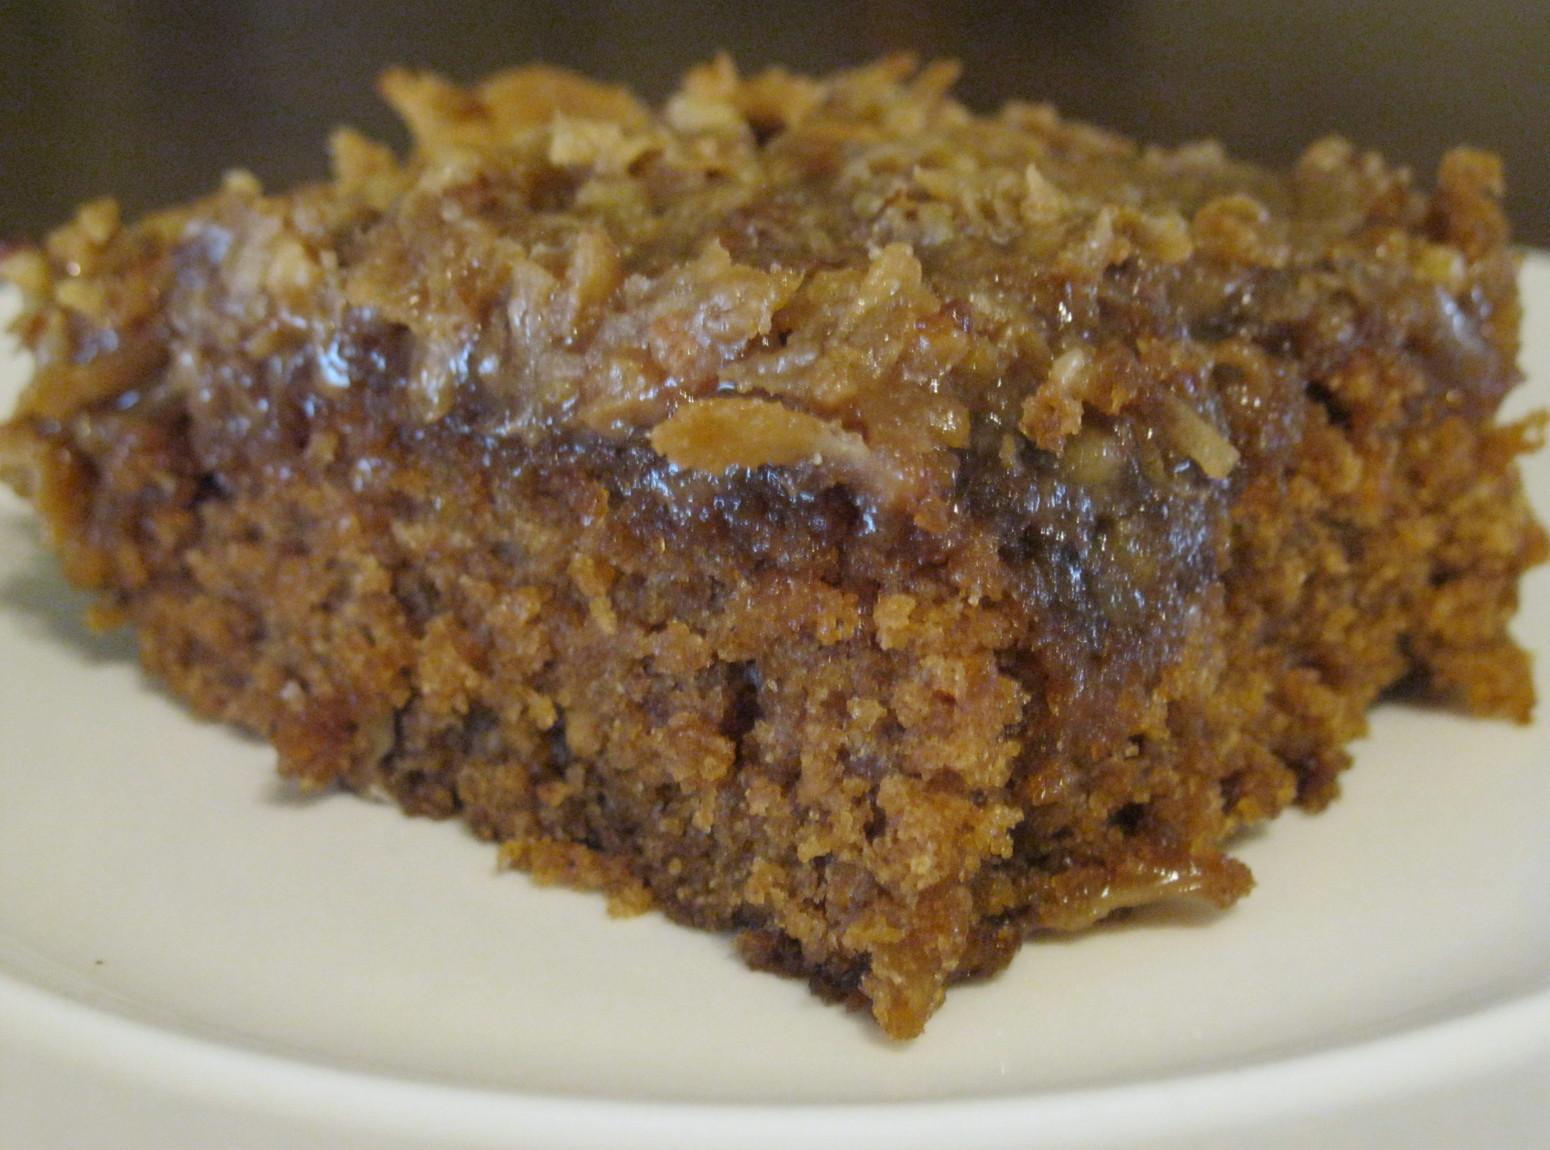 Oatmeal Dessert Recipe  Oatmeal Cake Recipe 12